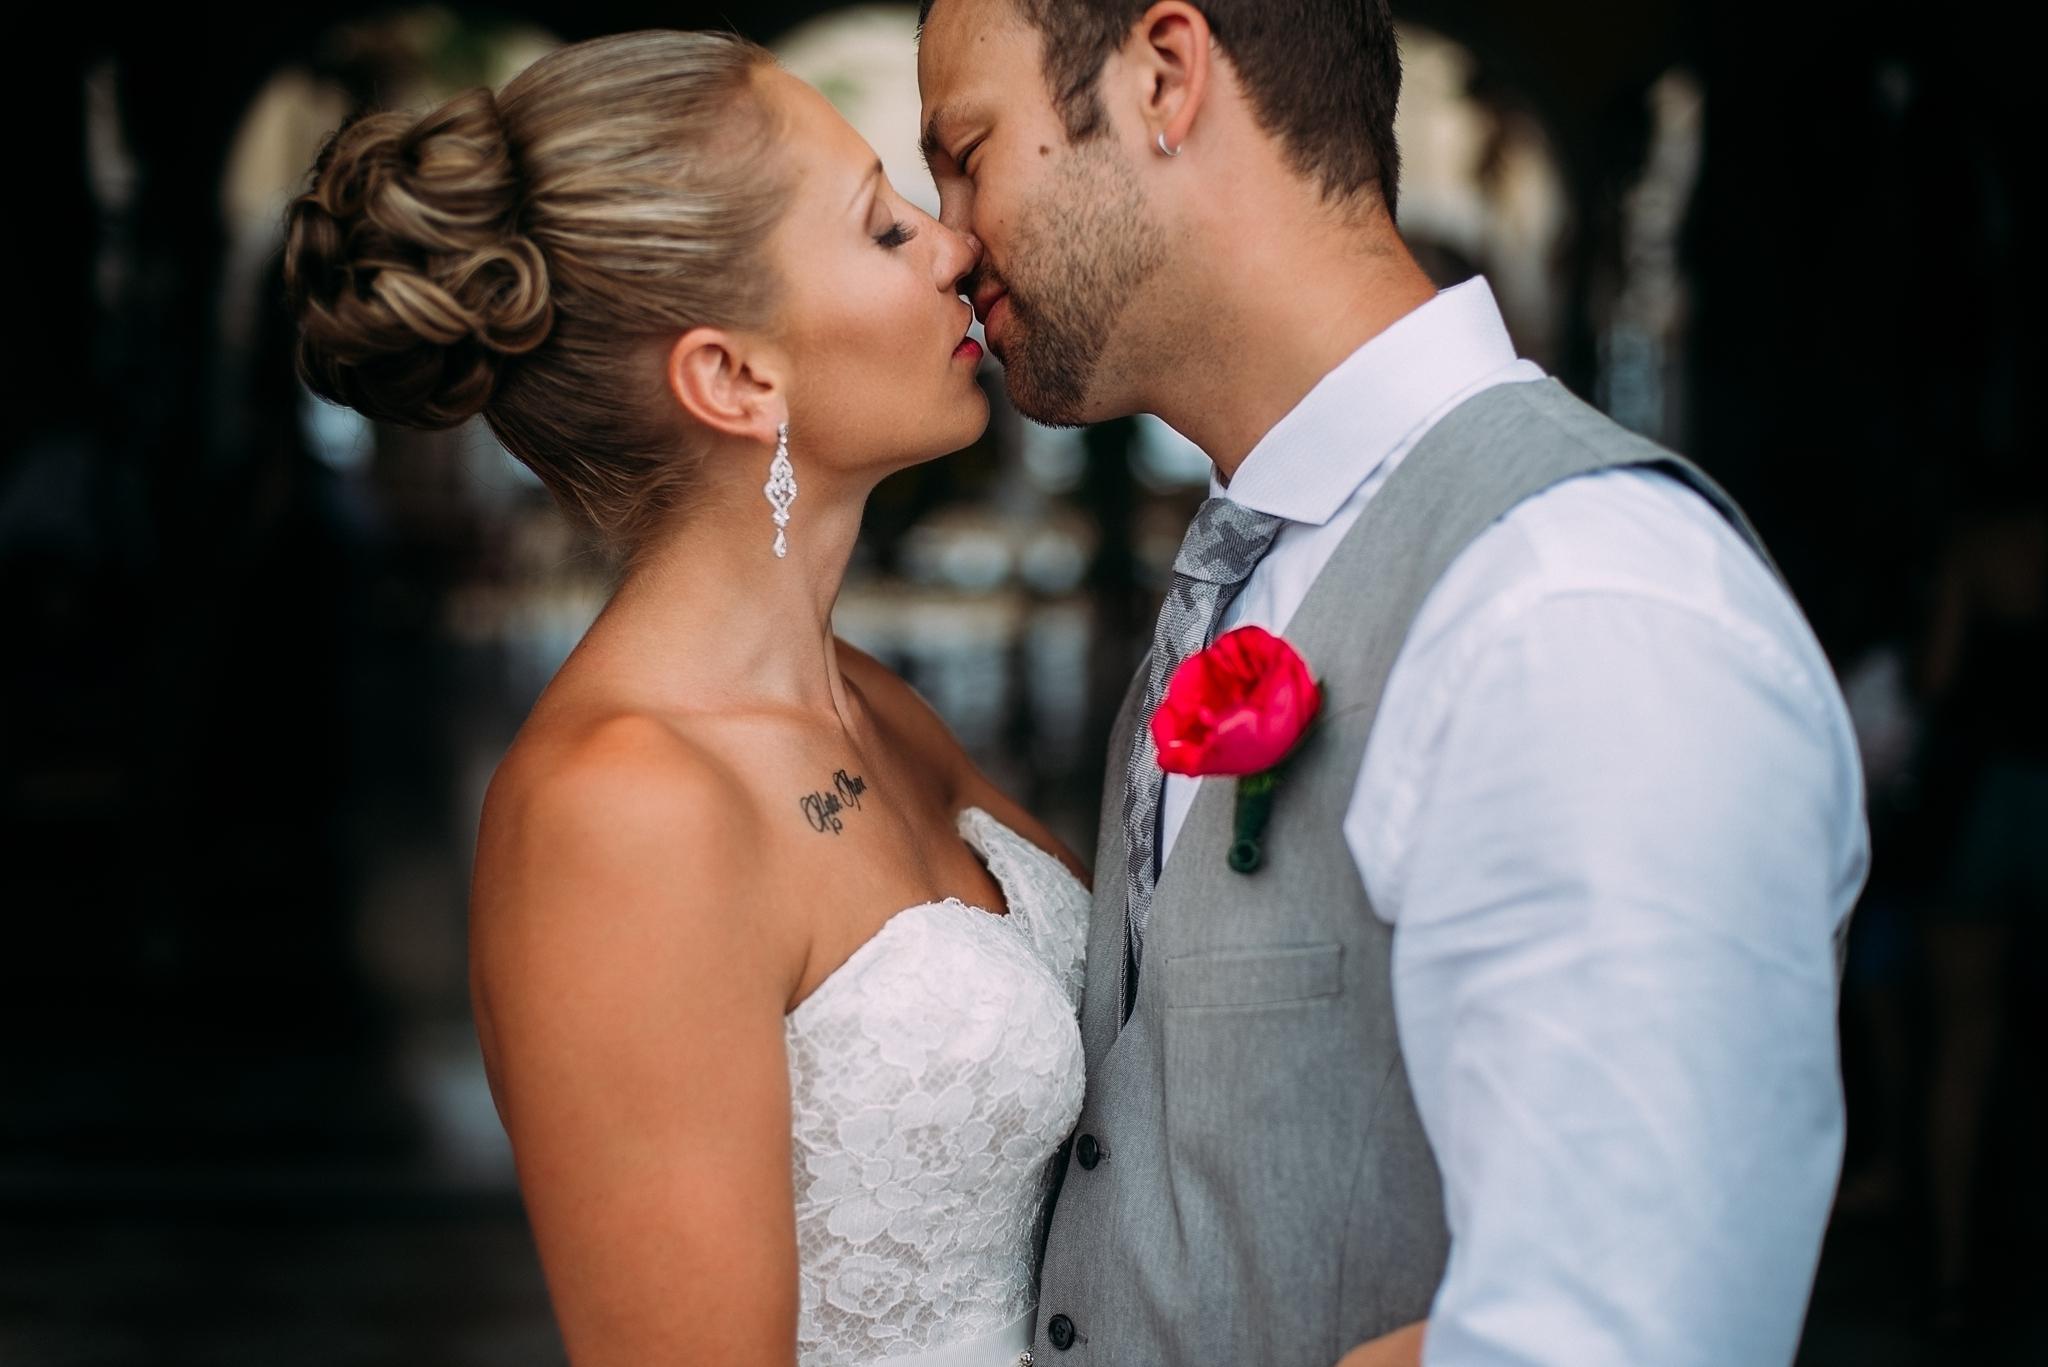 kaihla_tonai_intimate_wedding_elopement_photographer_1394